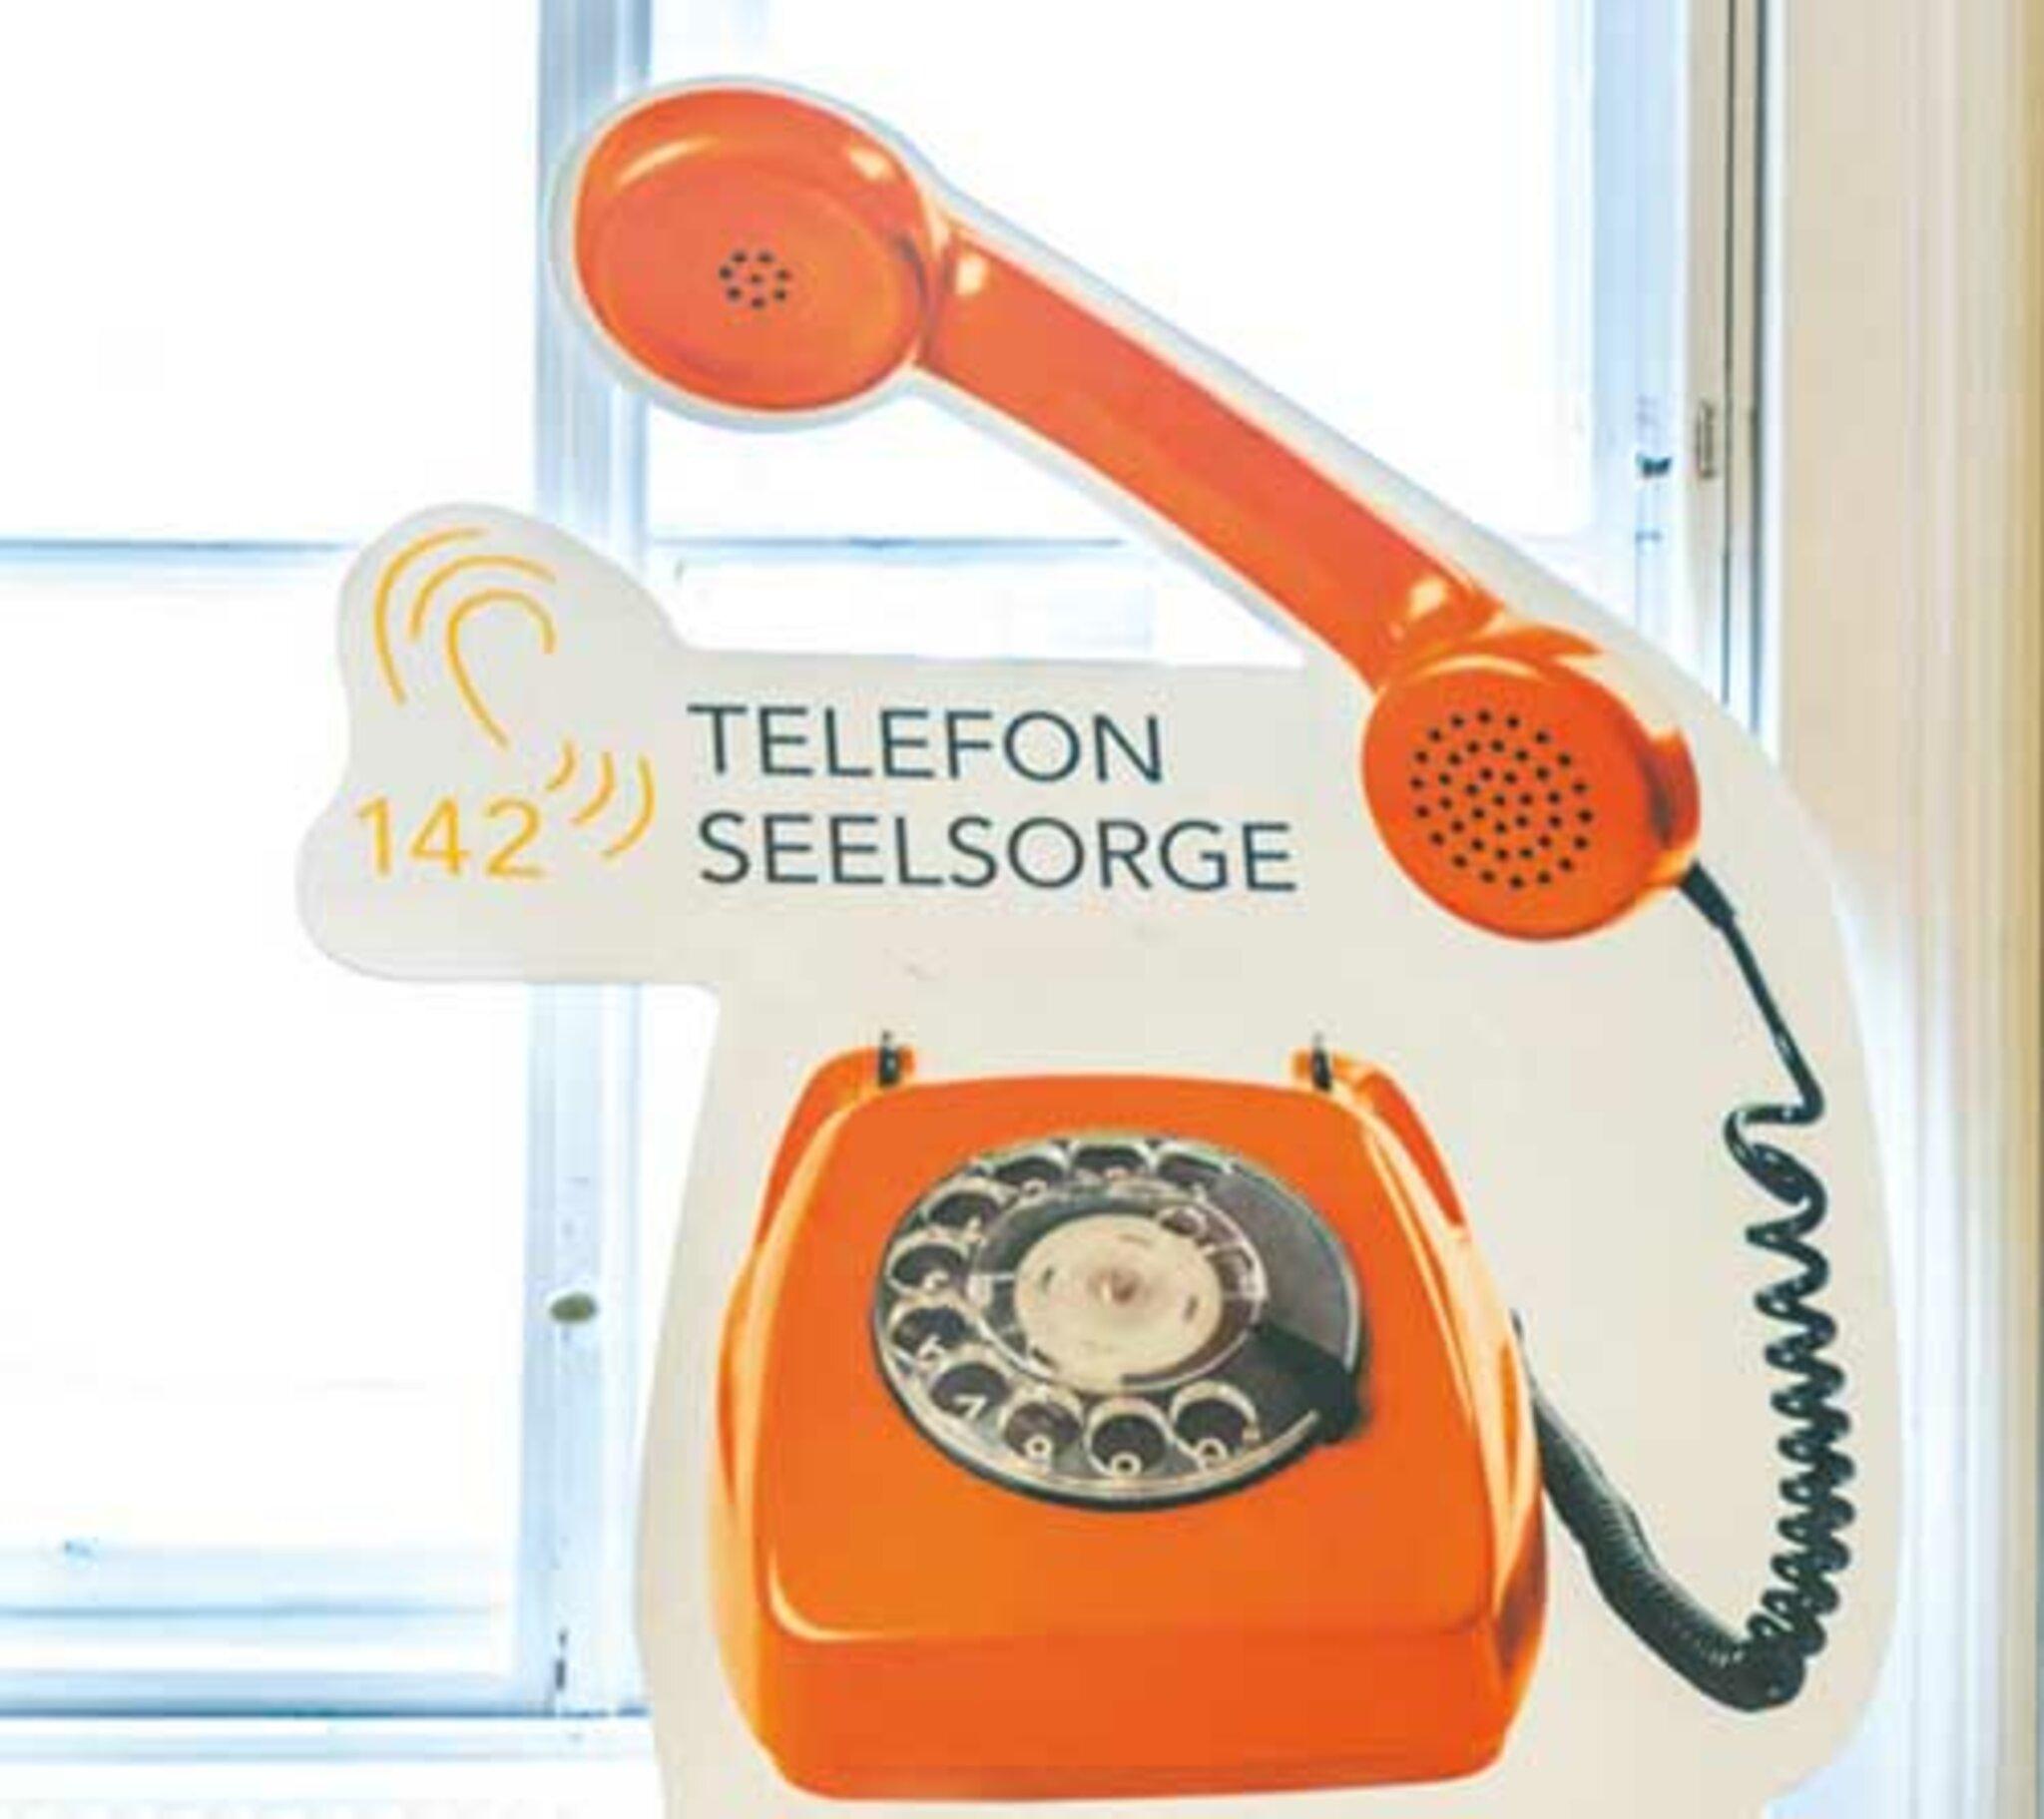 Telefonseelsorge